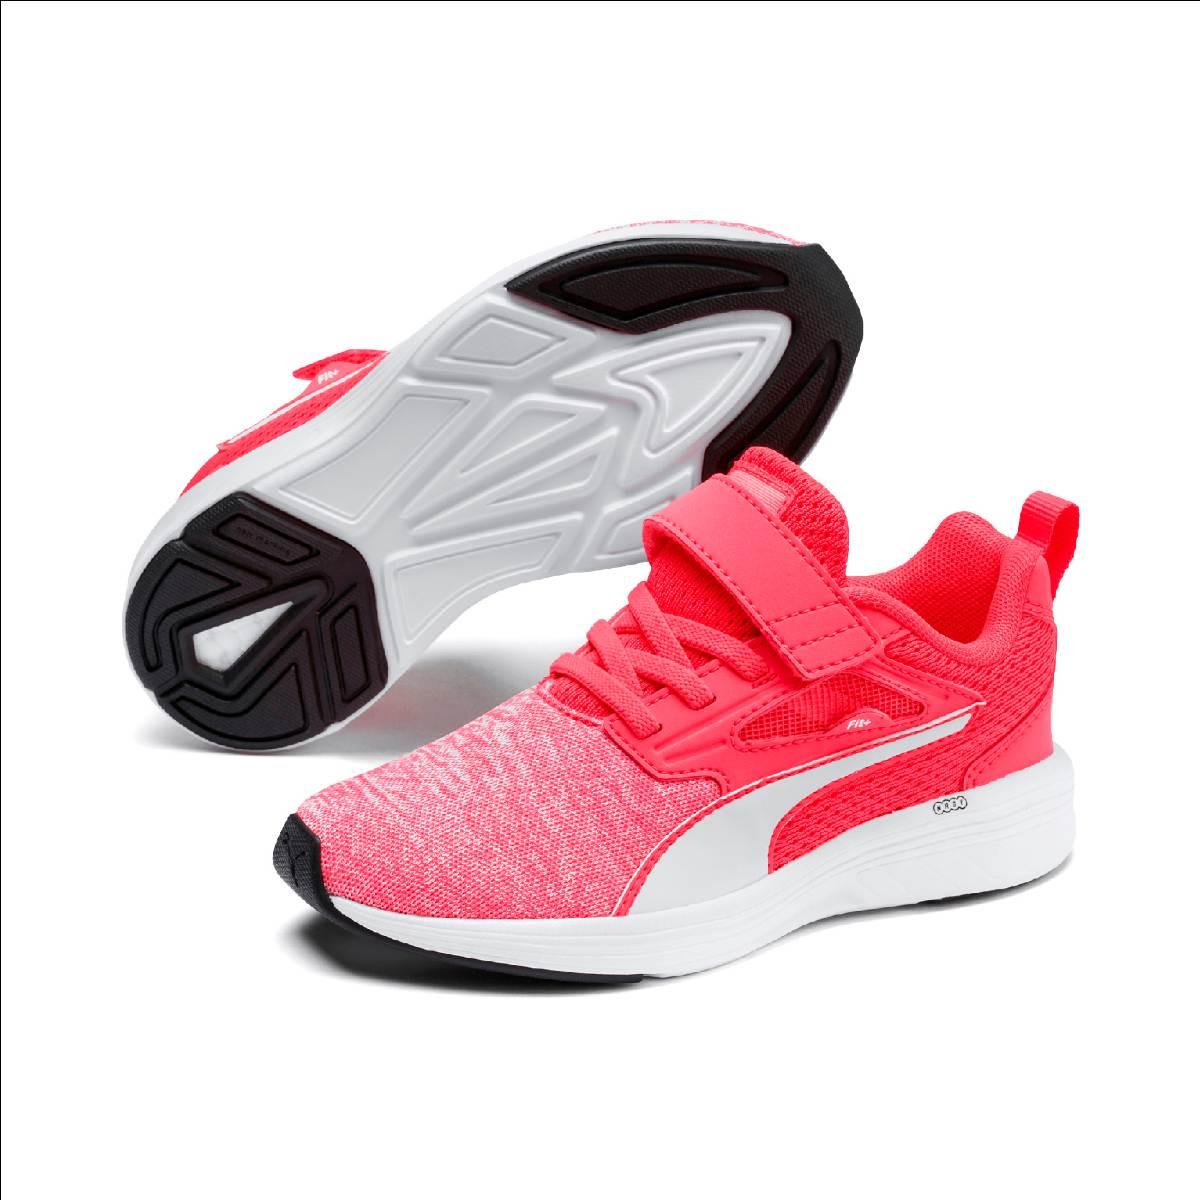 Puma NRGY Rupure Sko Pink Junior